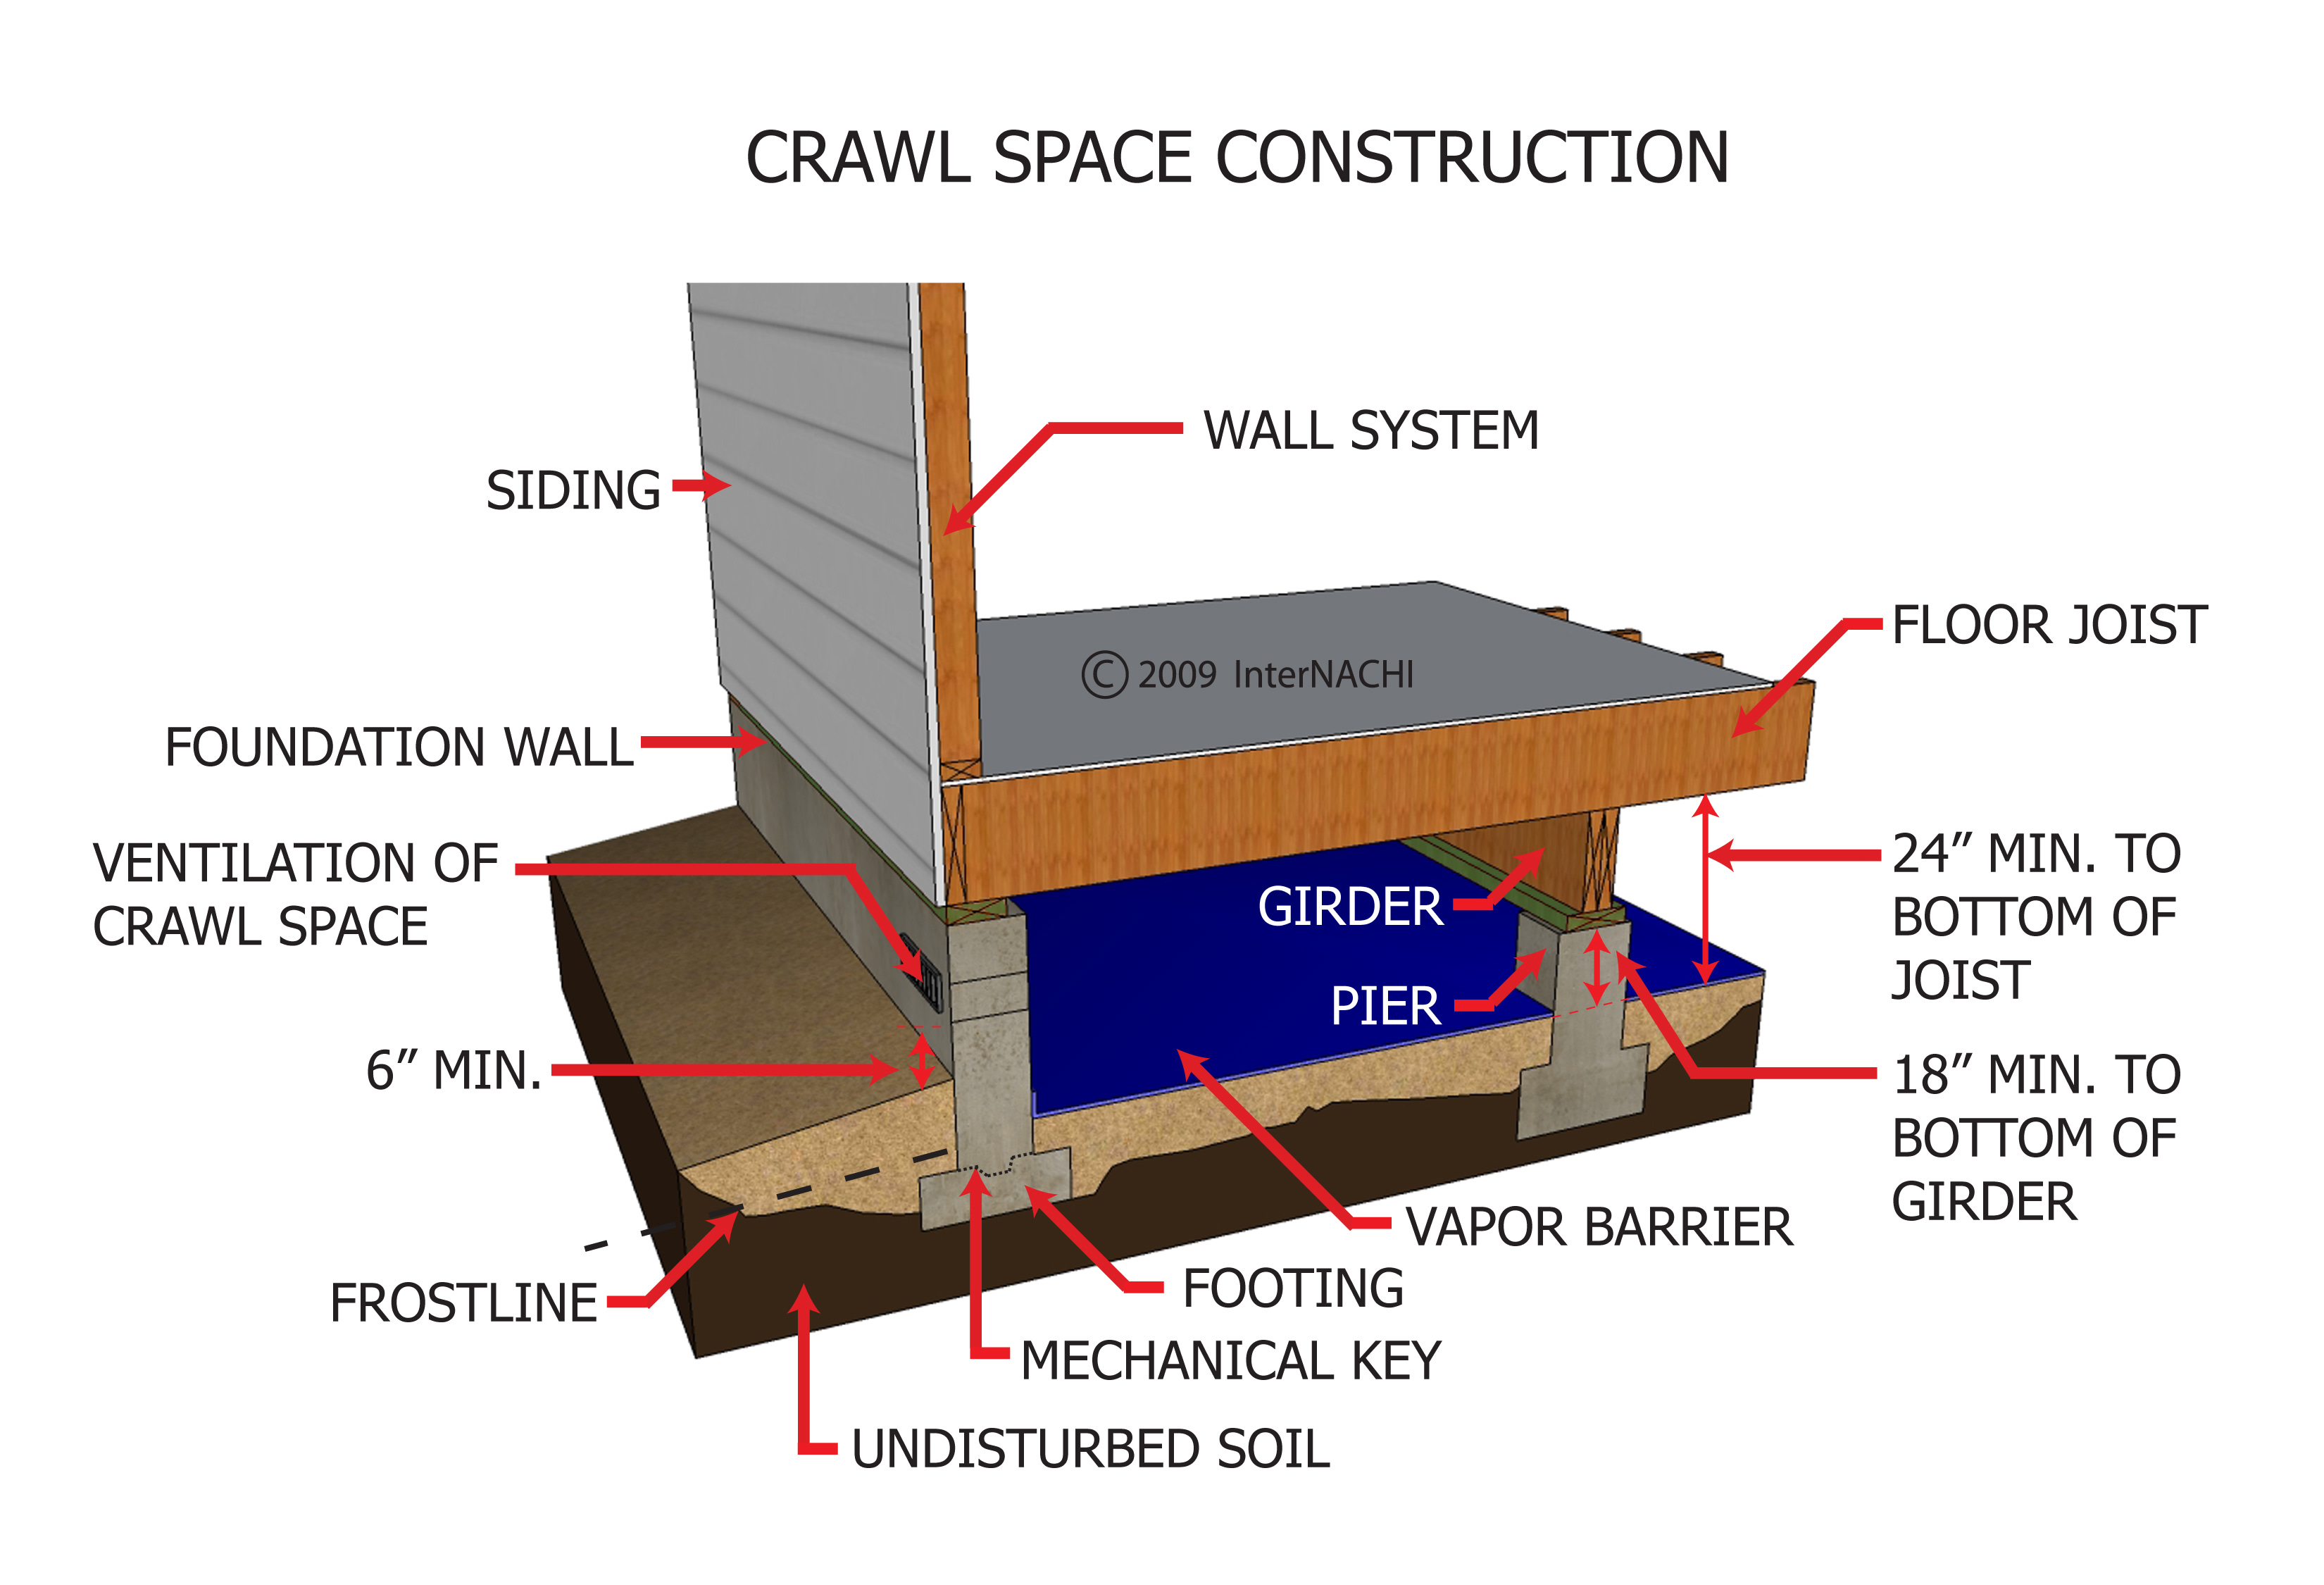 Crawl space construction.